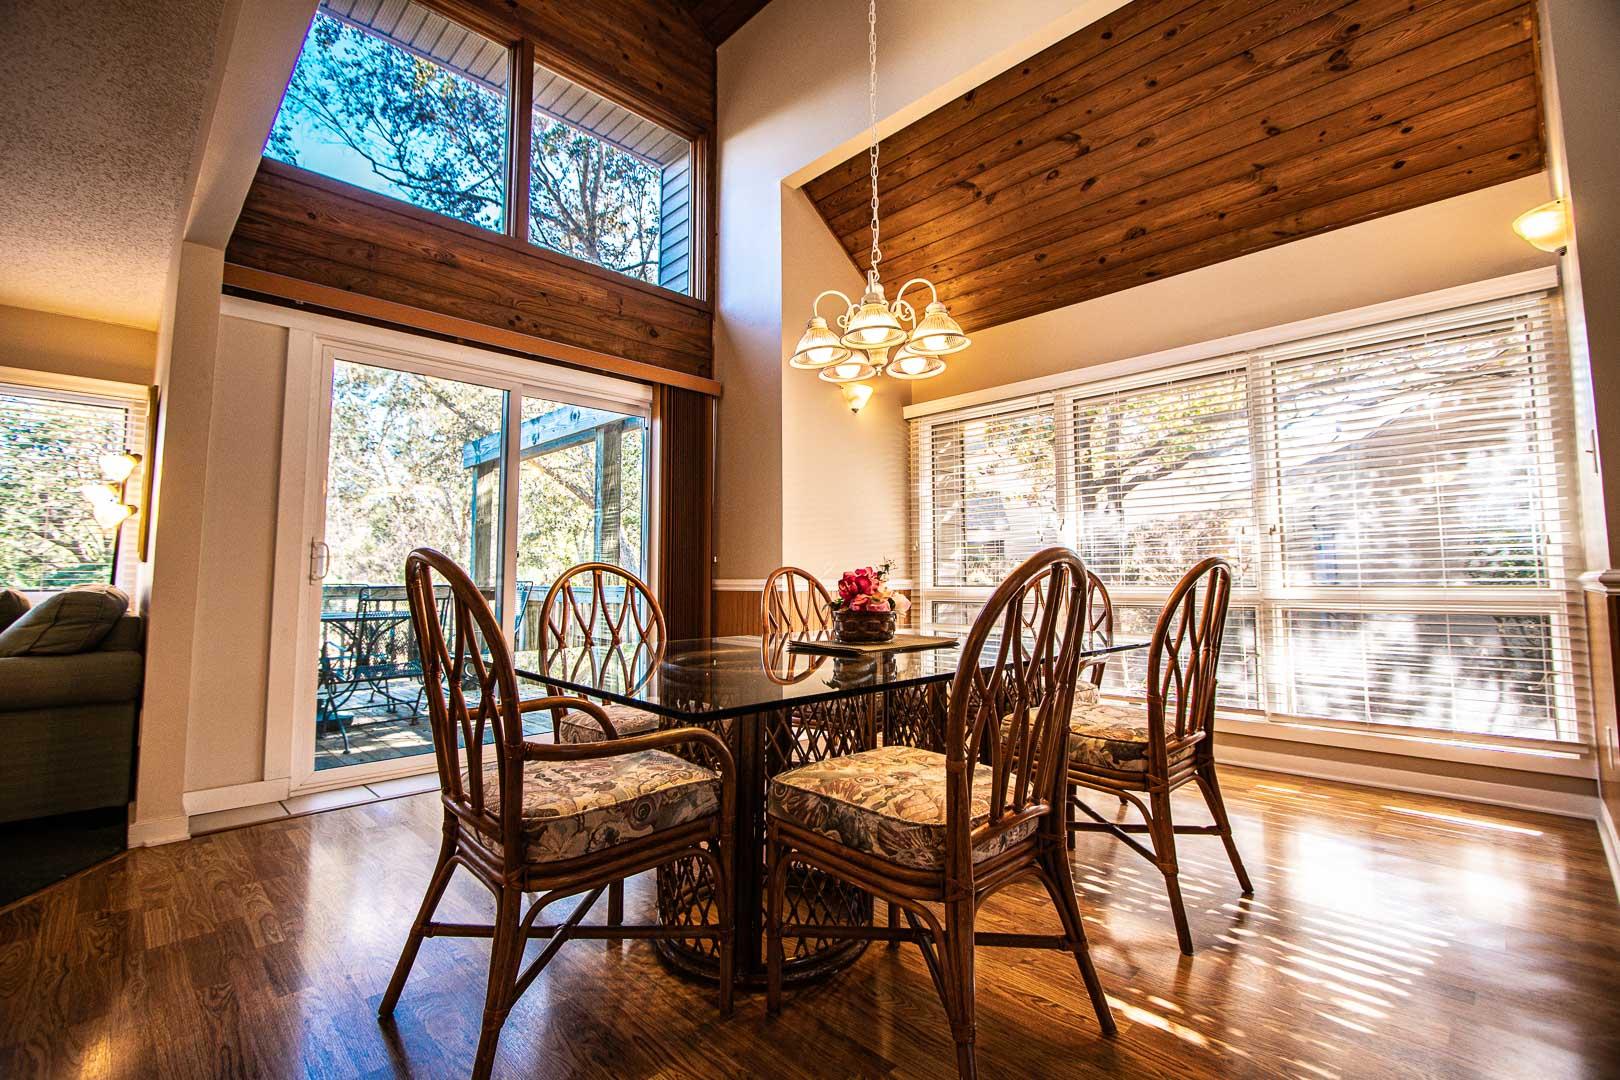 A modern dining room at VRI's Sandcastle Village in New Bern, North Carolina.